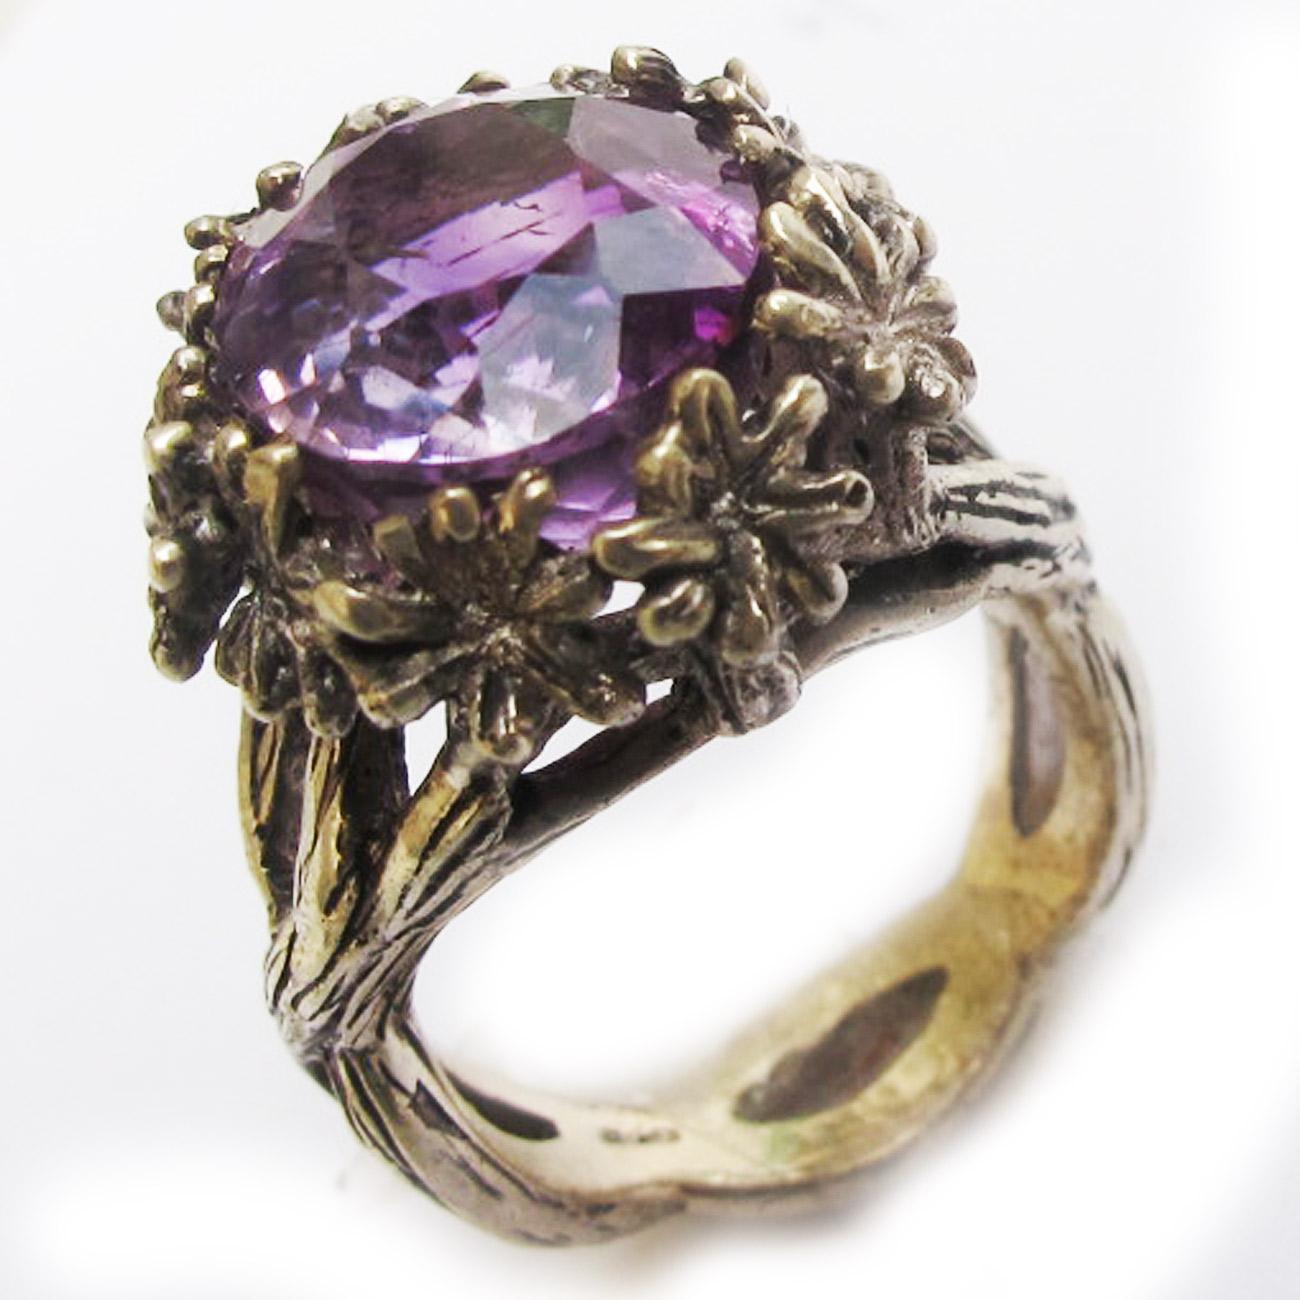 แหวนแอเมทีสต์